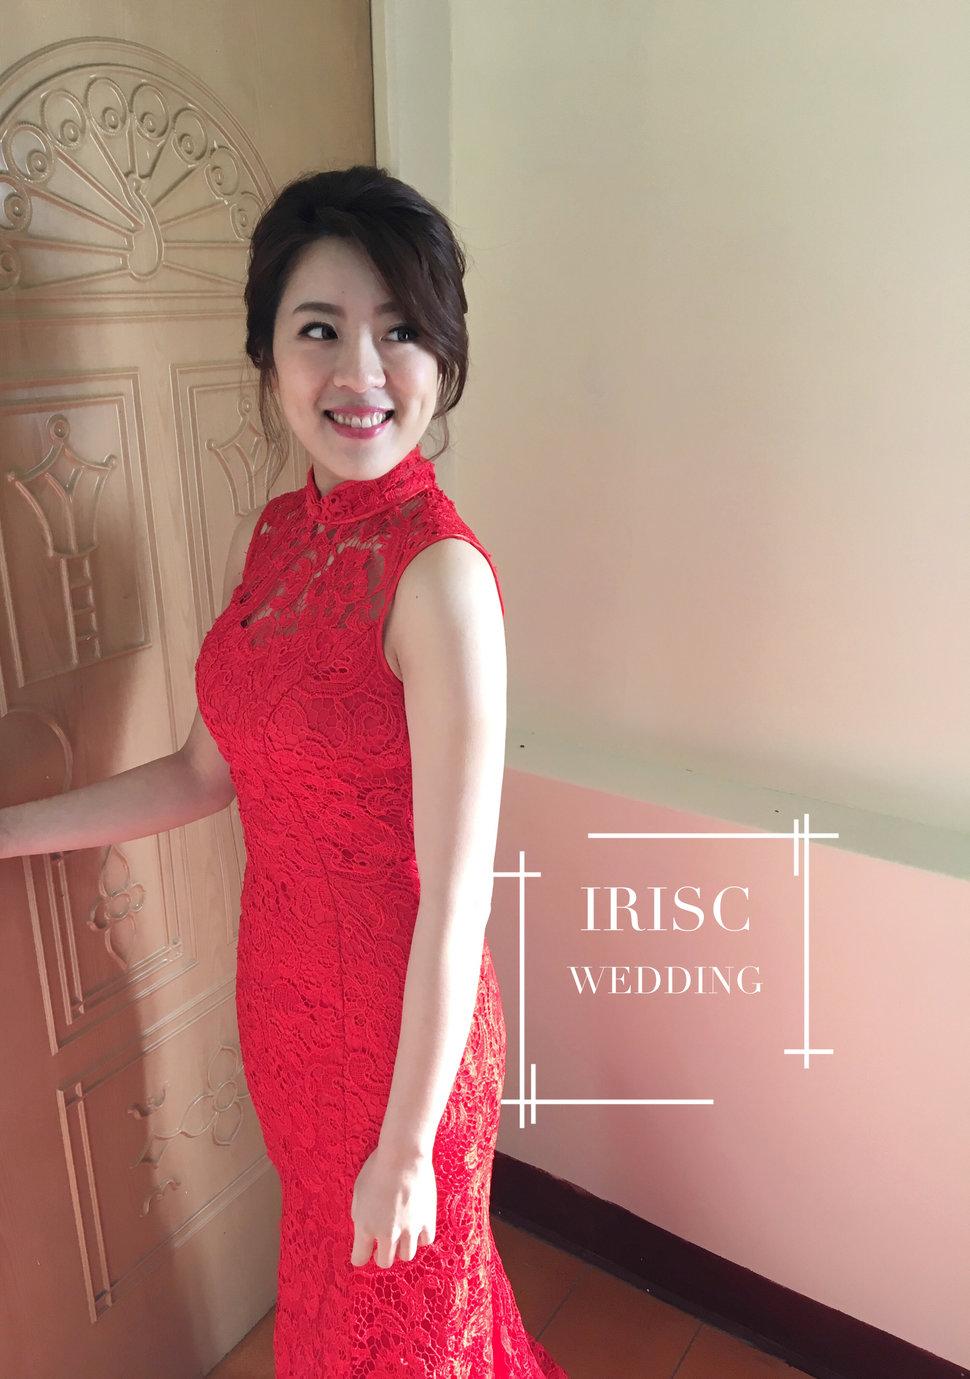 IMG_9517 - IRISC WEDDING - 結婚吧